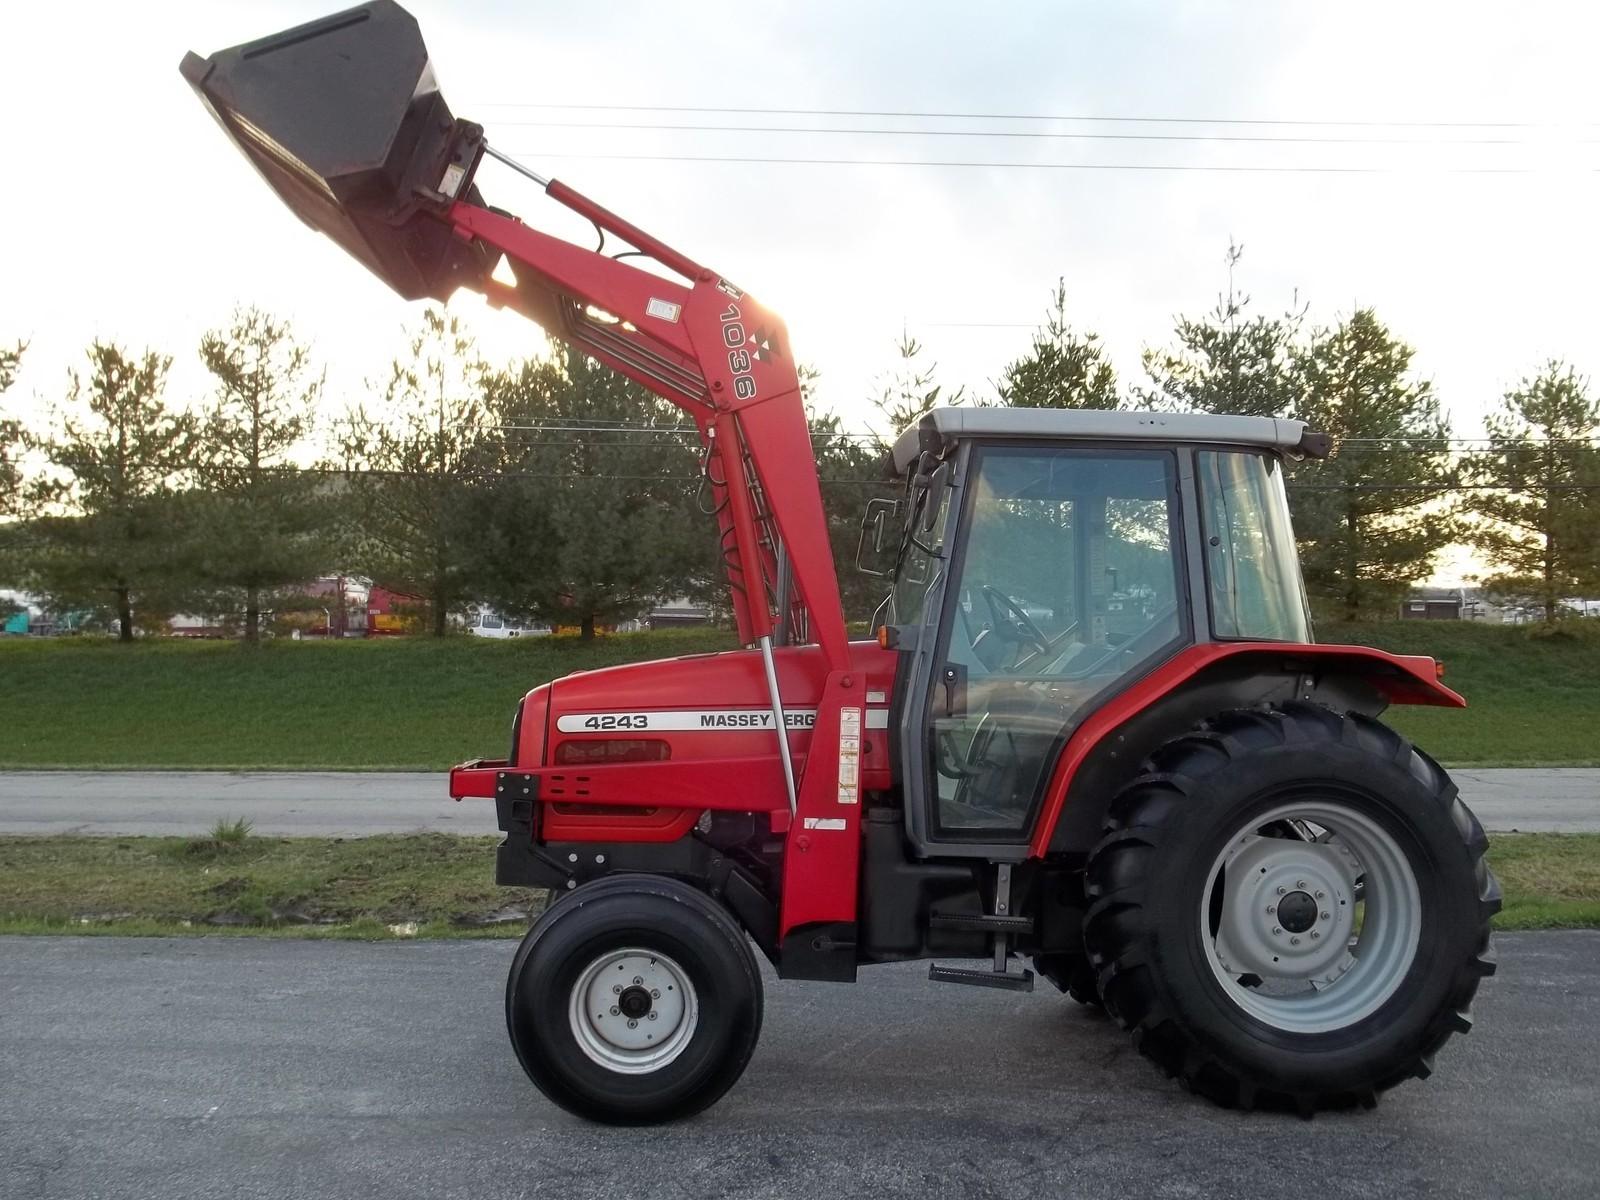 2004 massey ferguson 4243 5400 eur tractors trucks pewsey ltd rh tractors trucks blogspot com 4243 Massey Ferguson Pricing massey ferguson 4243 manual